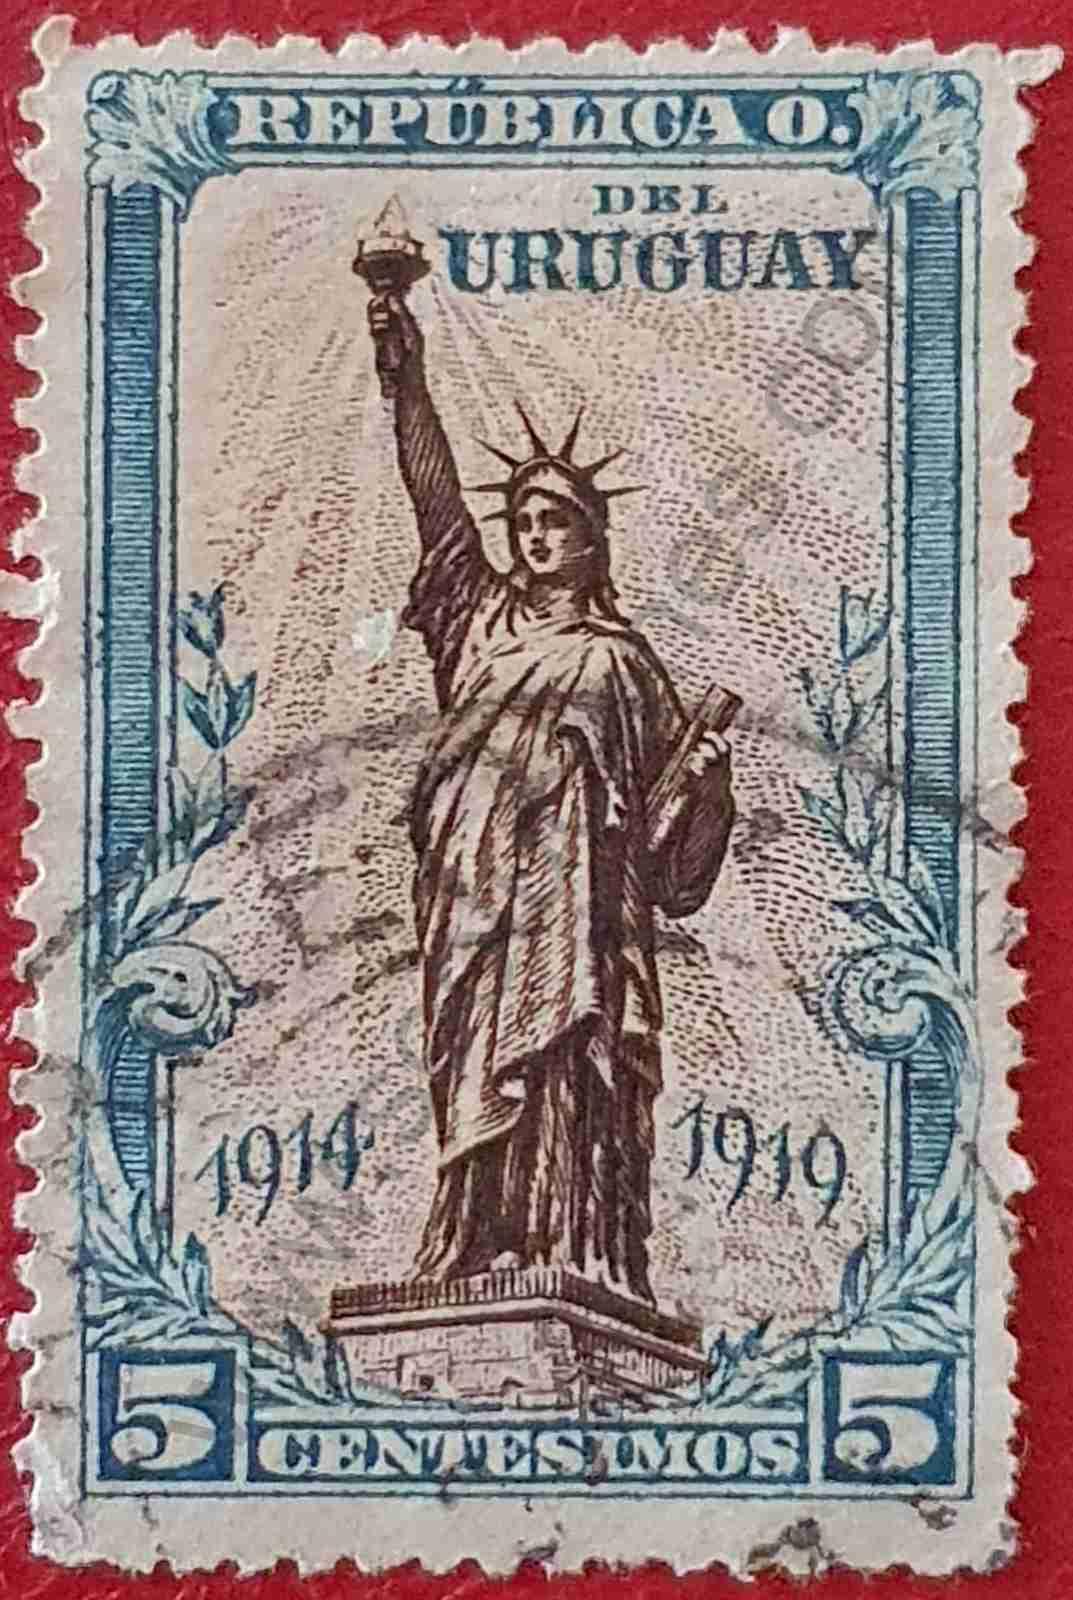 Sello Estatua de la Libertad 5c - Uruguay 1919